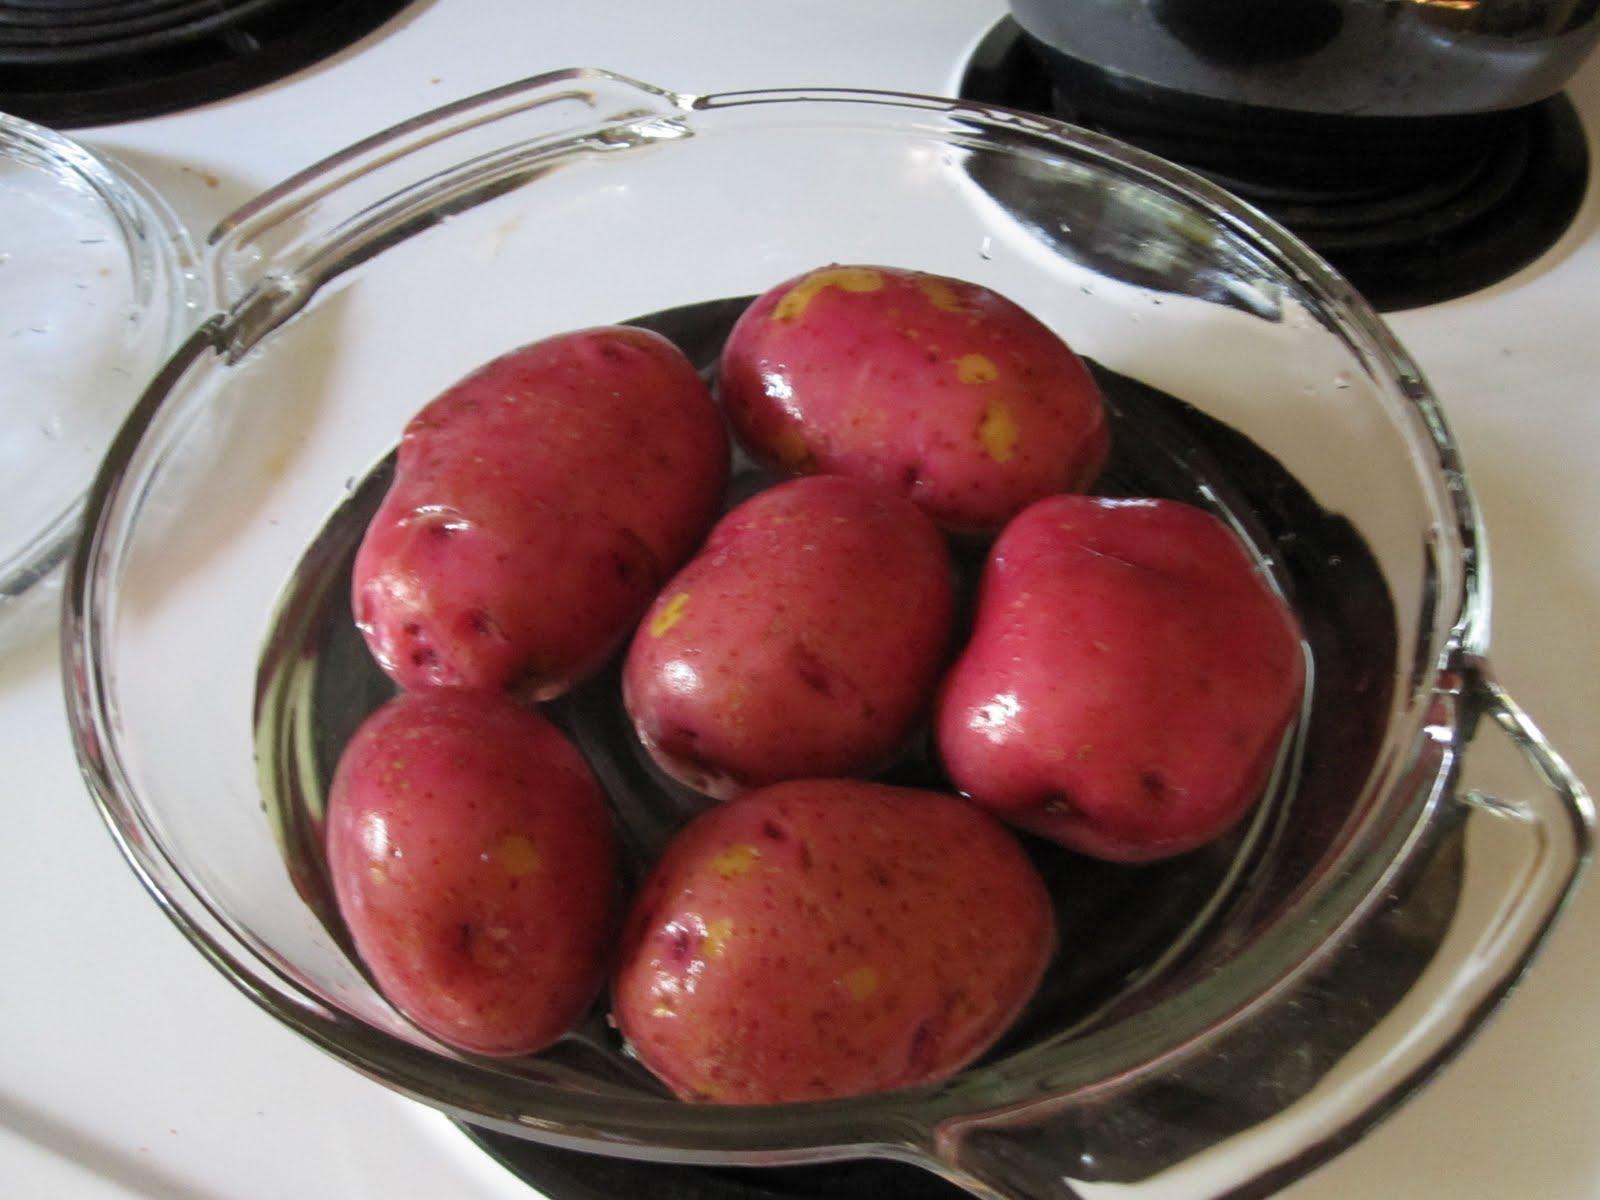 ... subbing Misa Ramirez's Spanish rice for the potatoes. Equally delish.